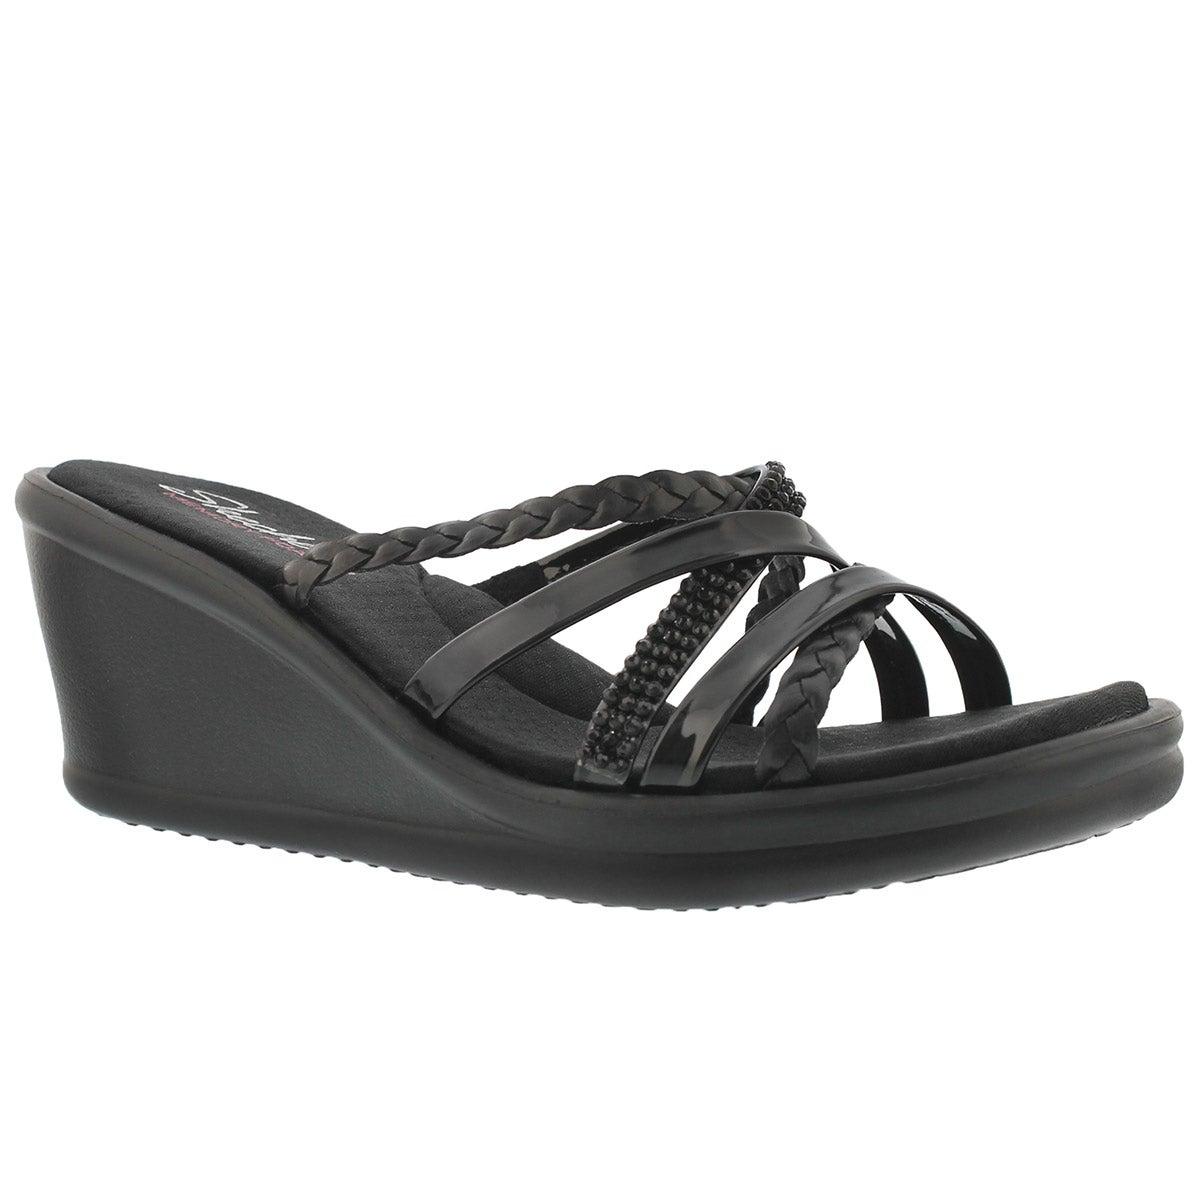 Women's WILD CHILD black wedge sandal